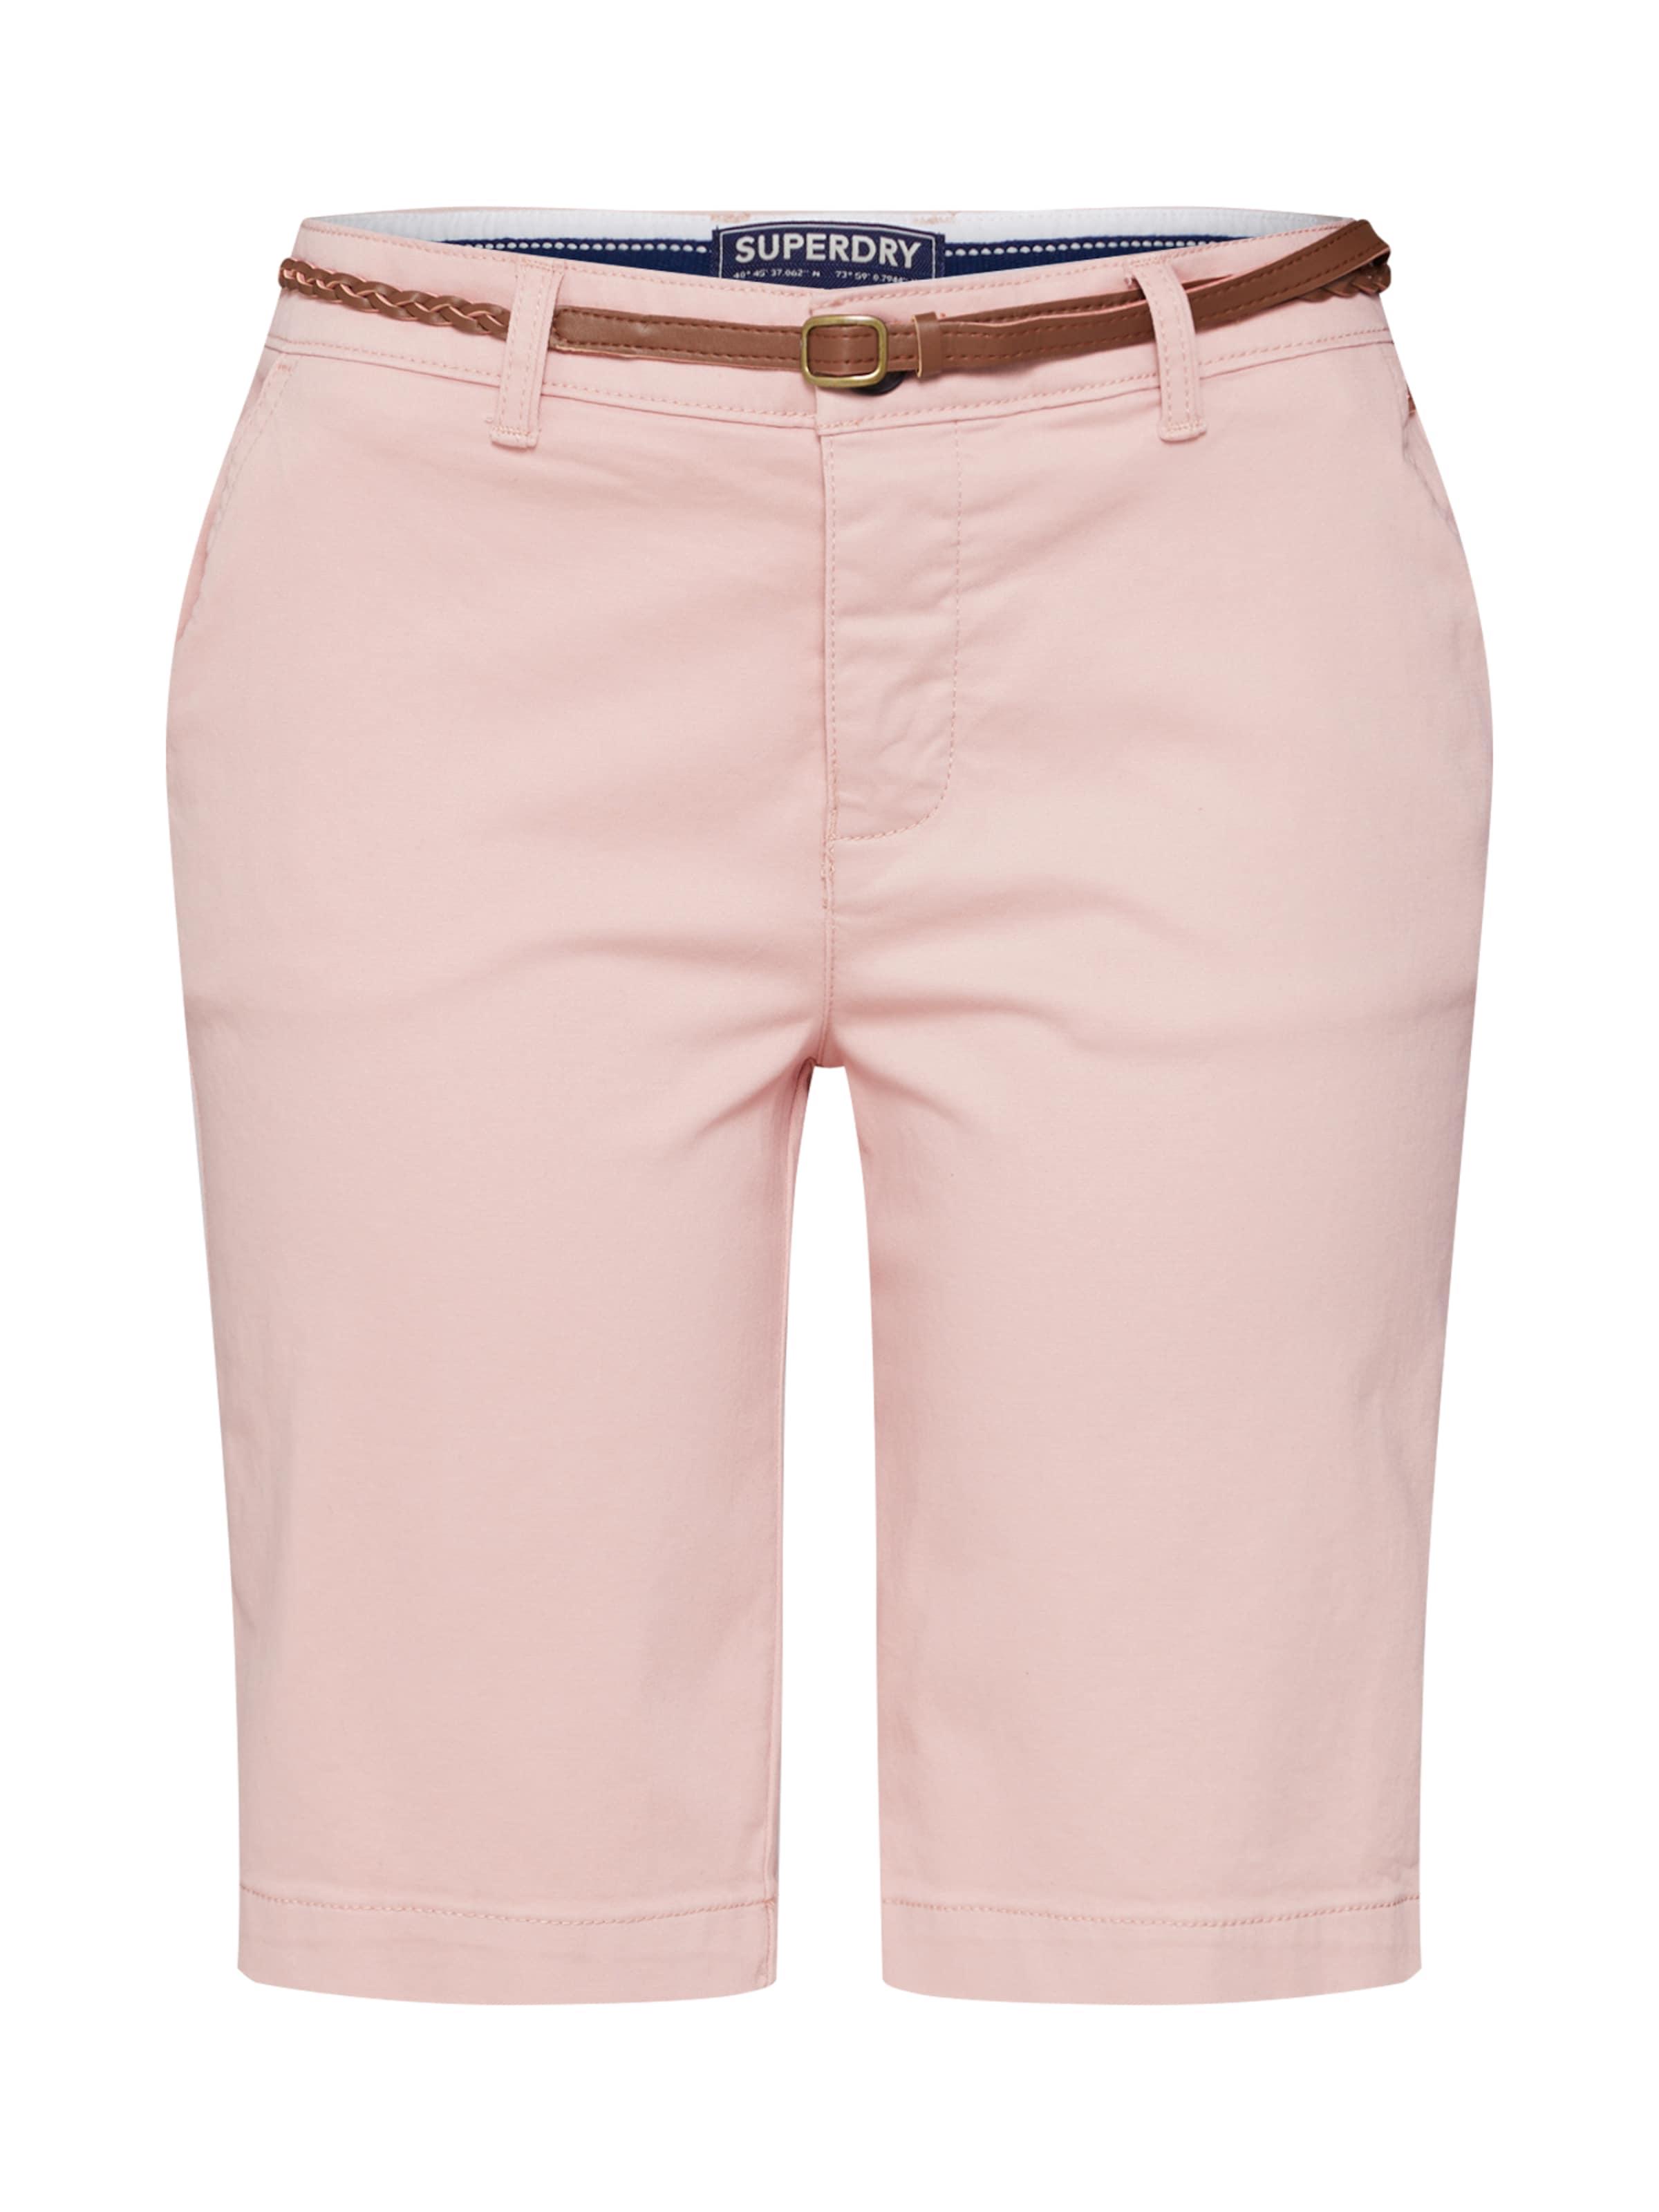 Short' En Superdry Pantalon 'chino City Rose Chino dCBoex